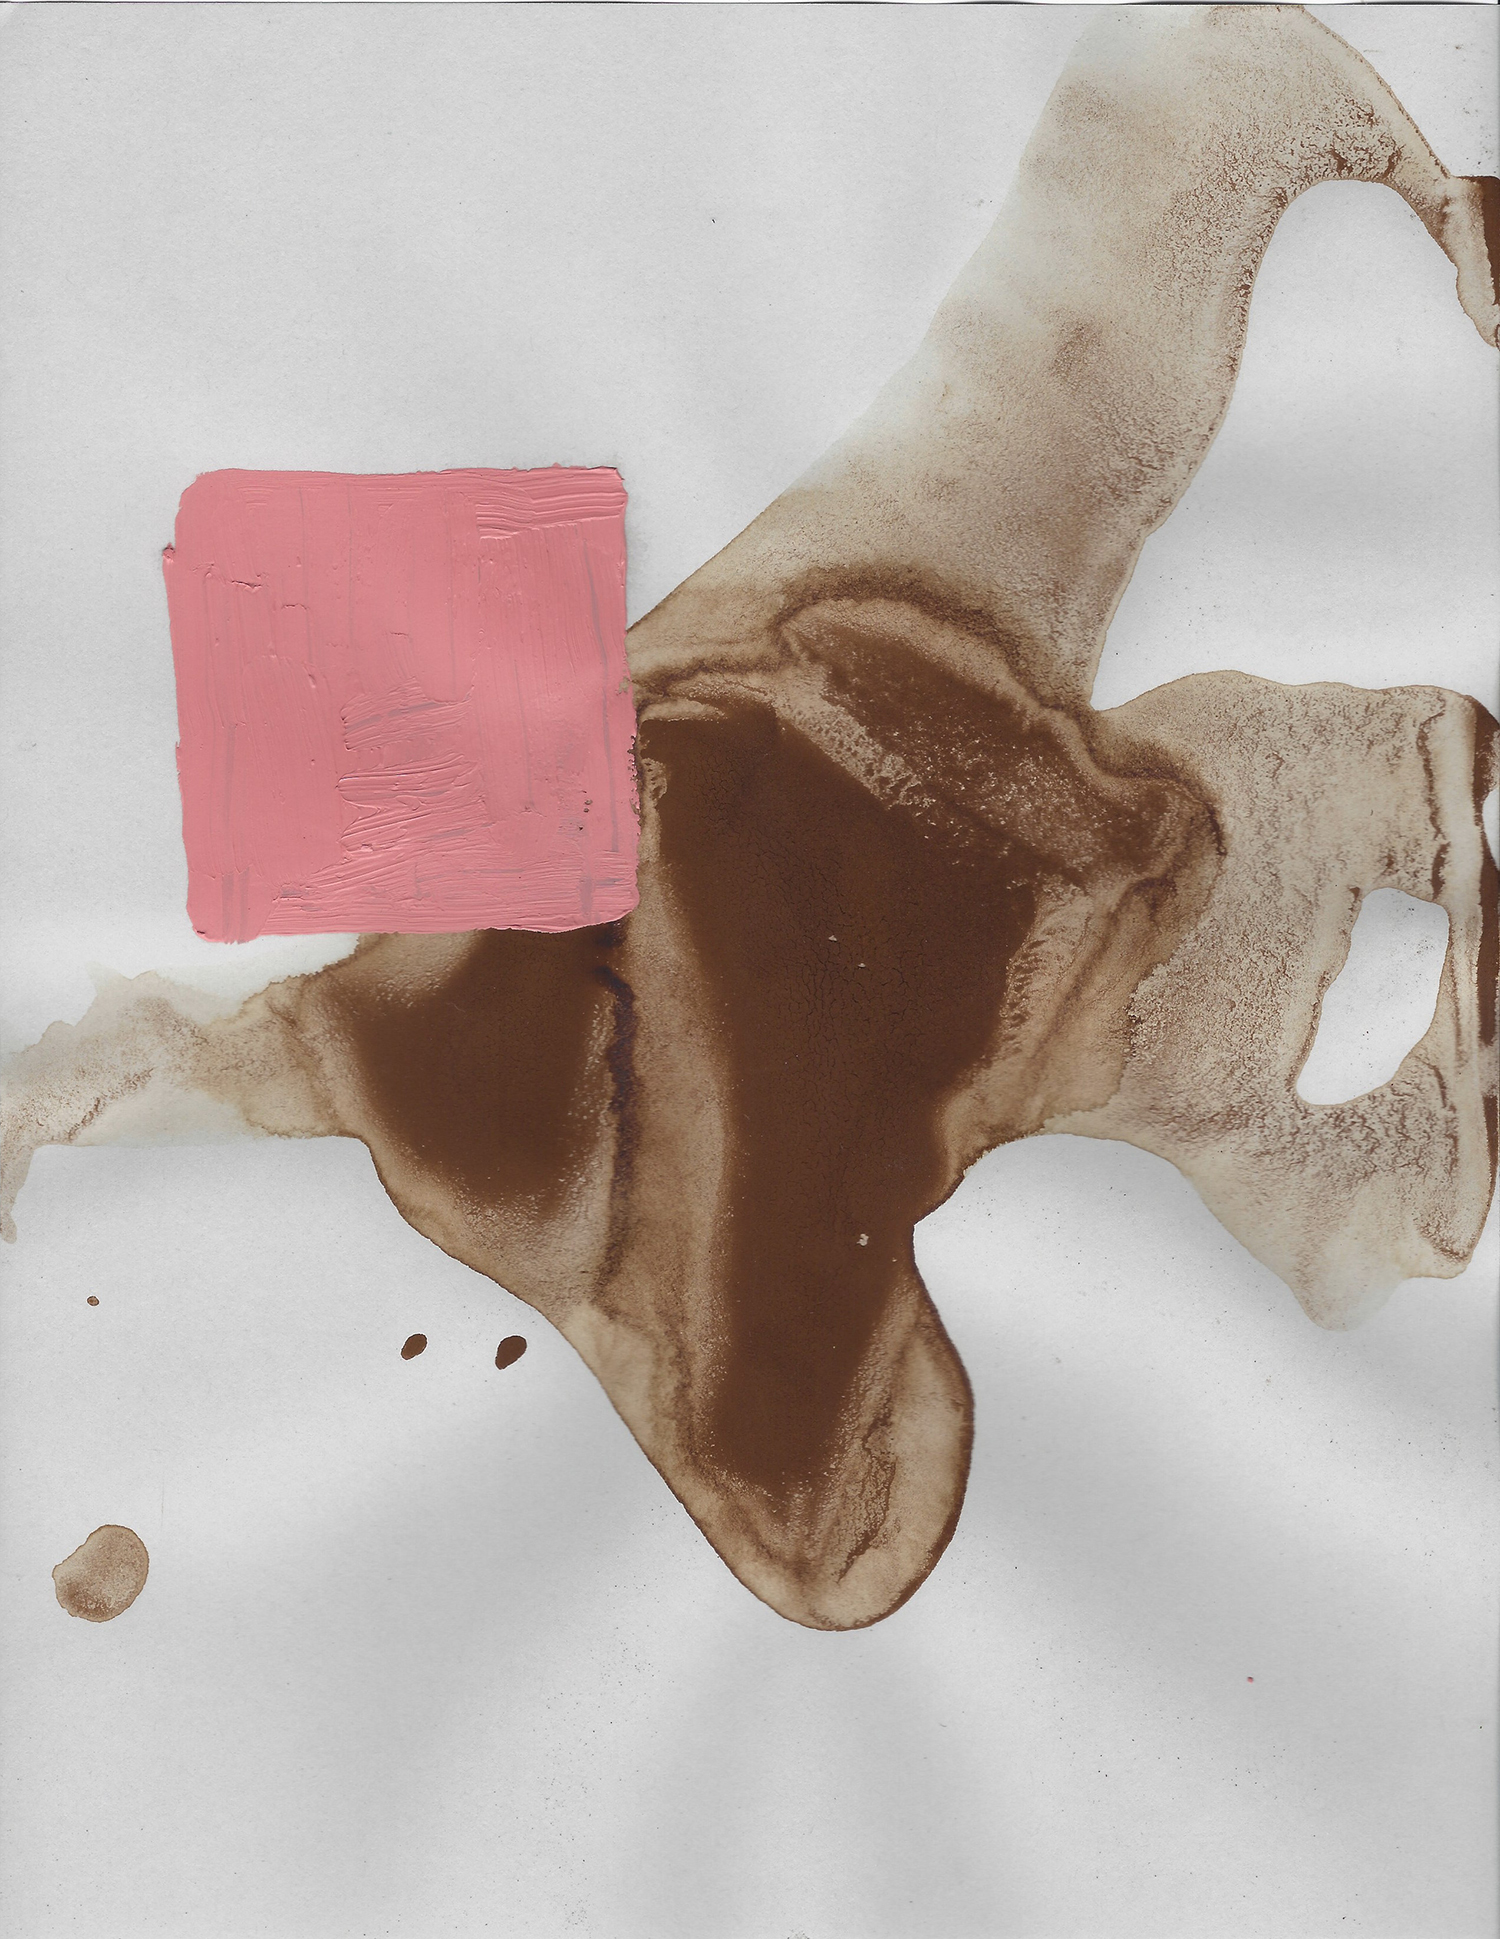 Terre des hommes  , 2017, óleo y café sobre papel, 28 x 22 cm.